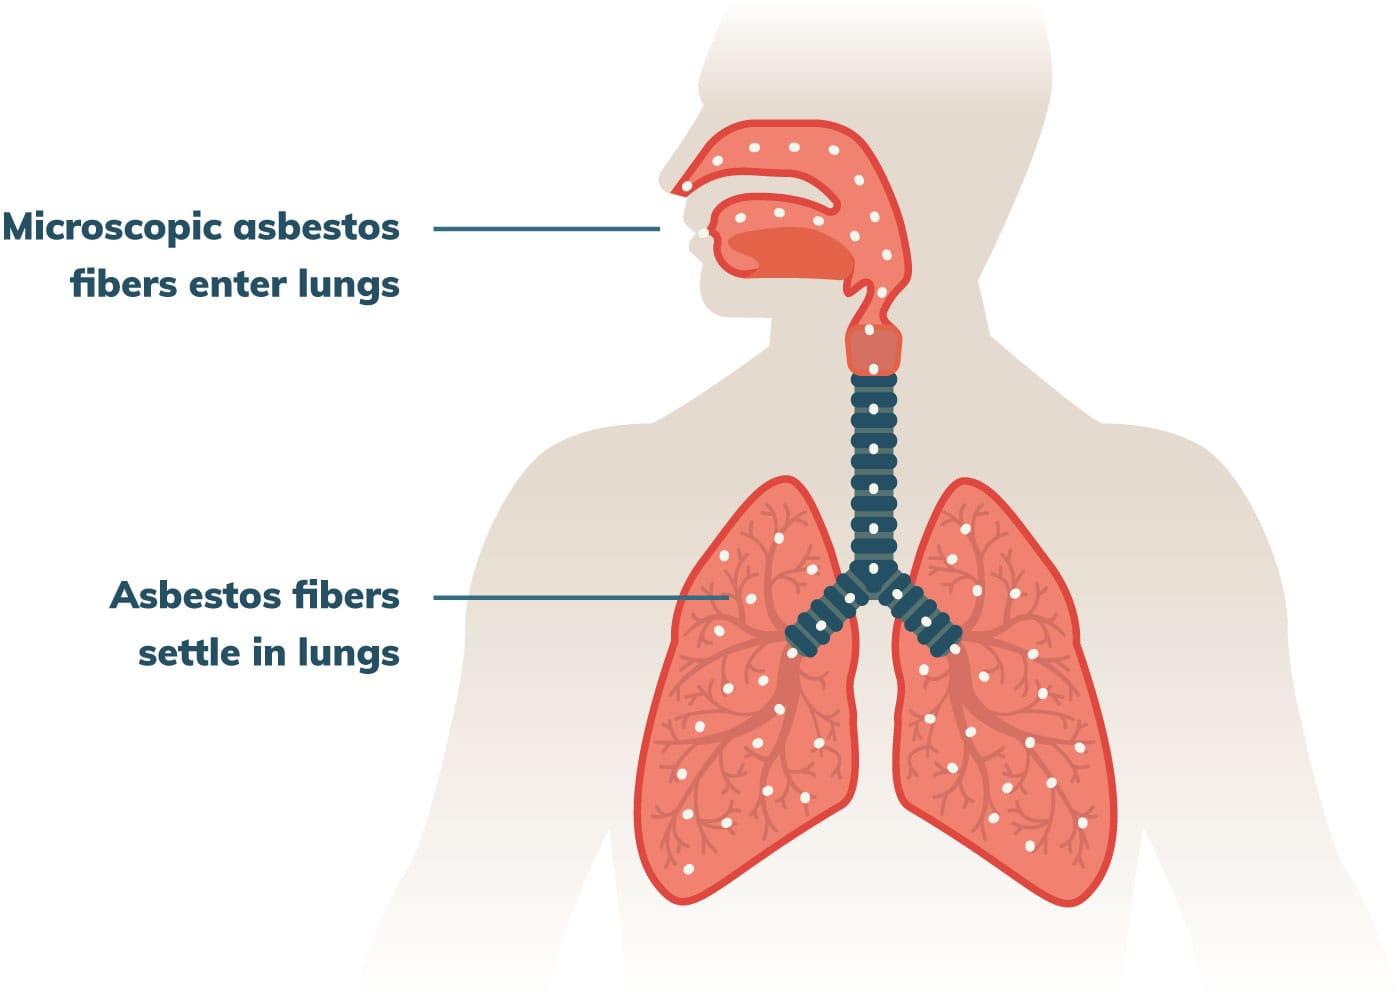 Asbestos Exposure | Types of Exposure, Health Risks & Prevention